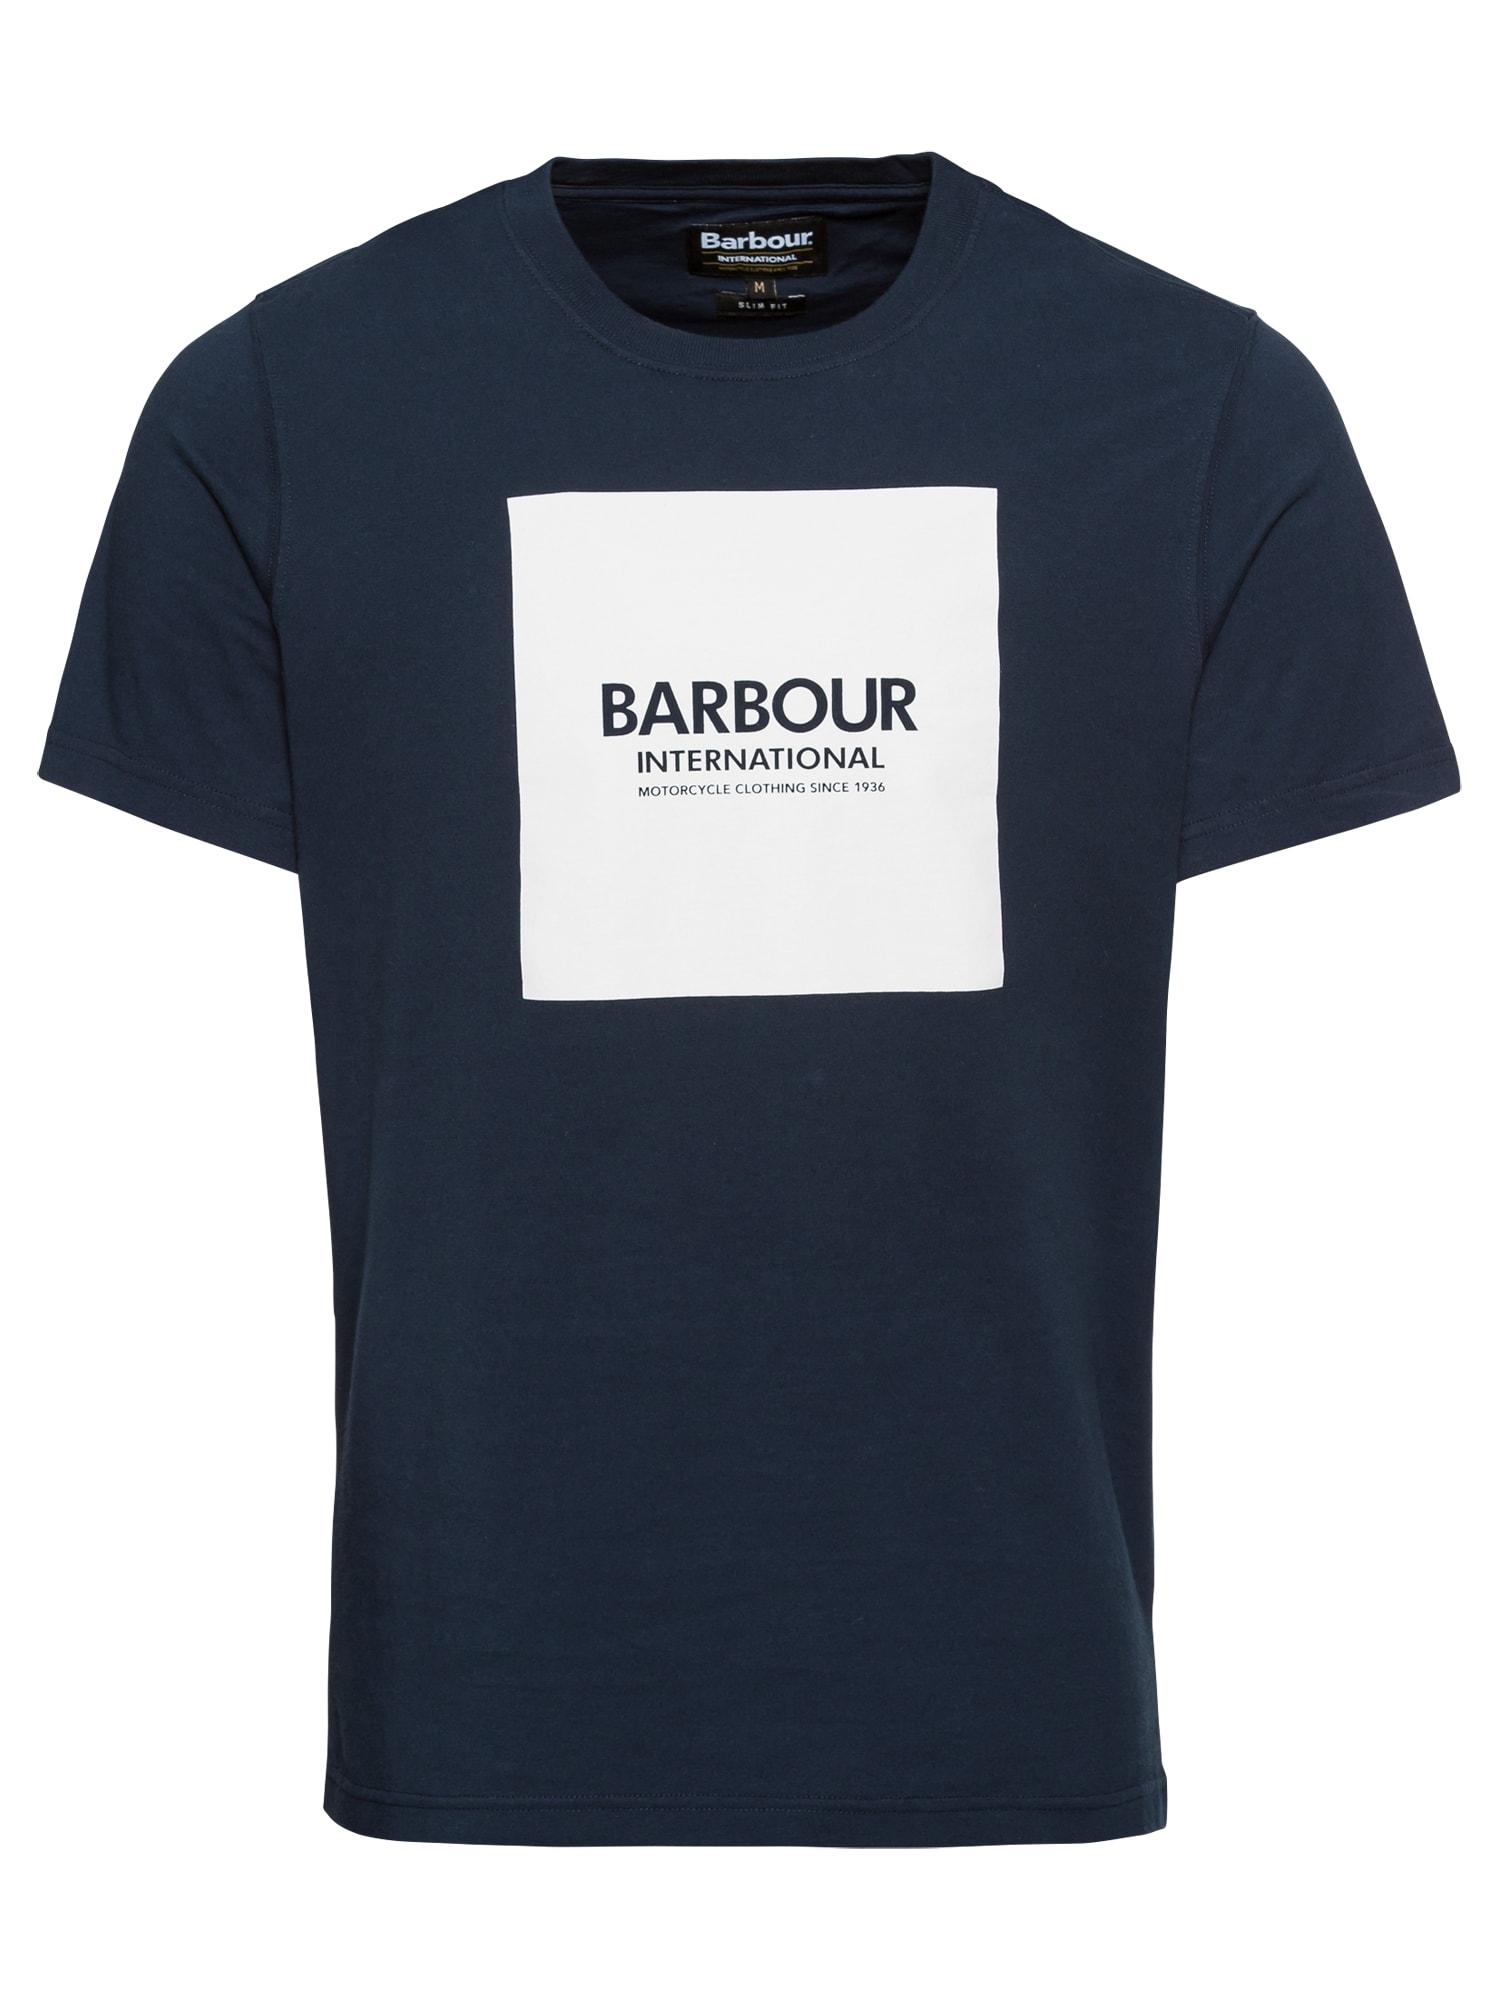 Tričko Block Tee námořnická modř bílá Barbour International